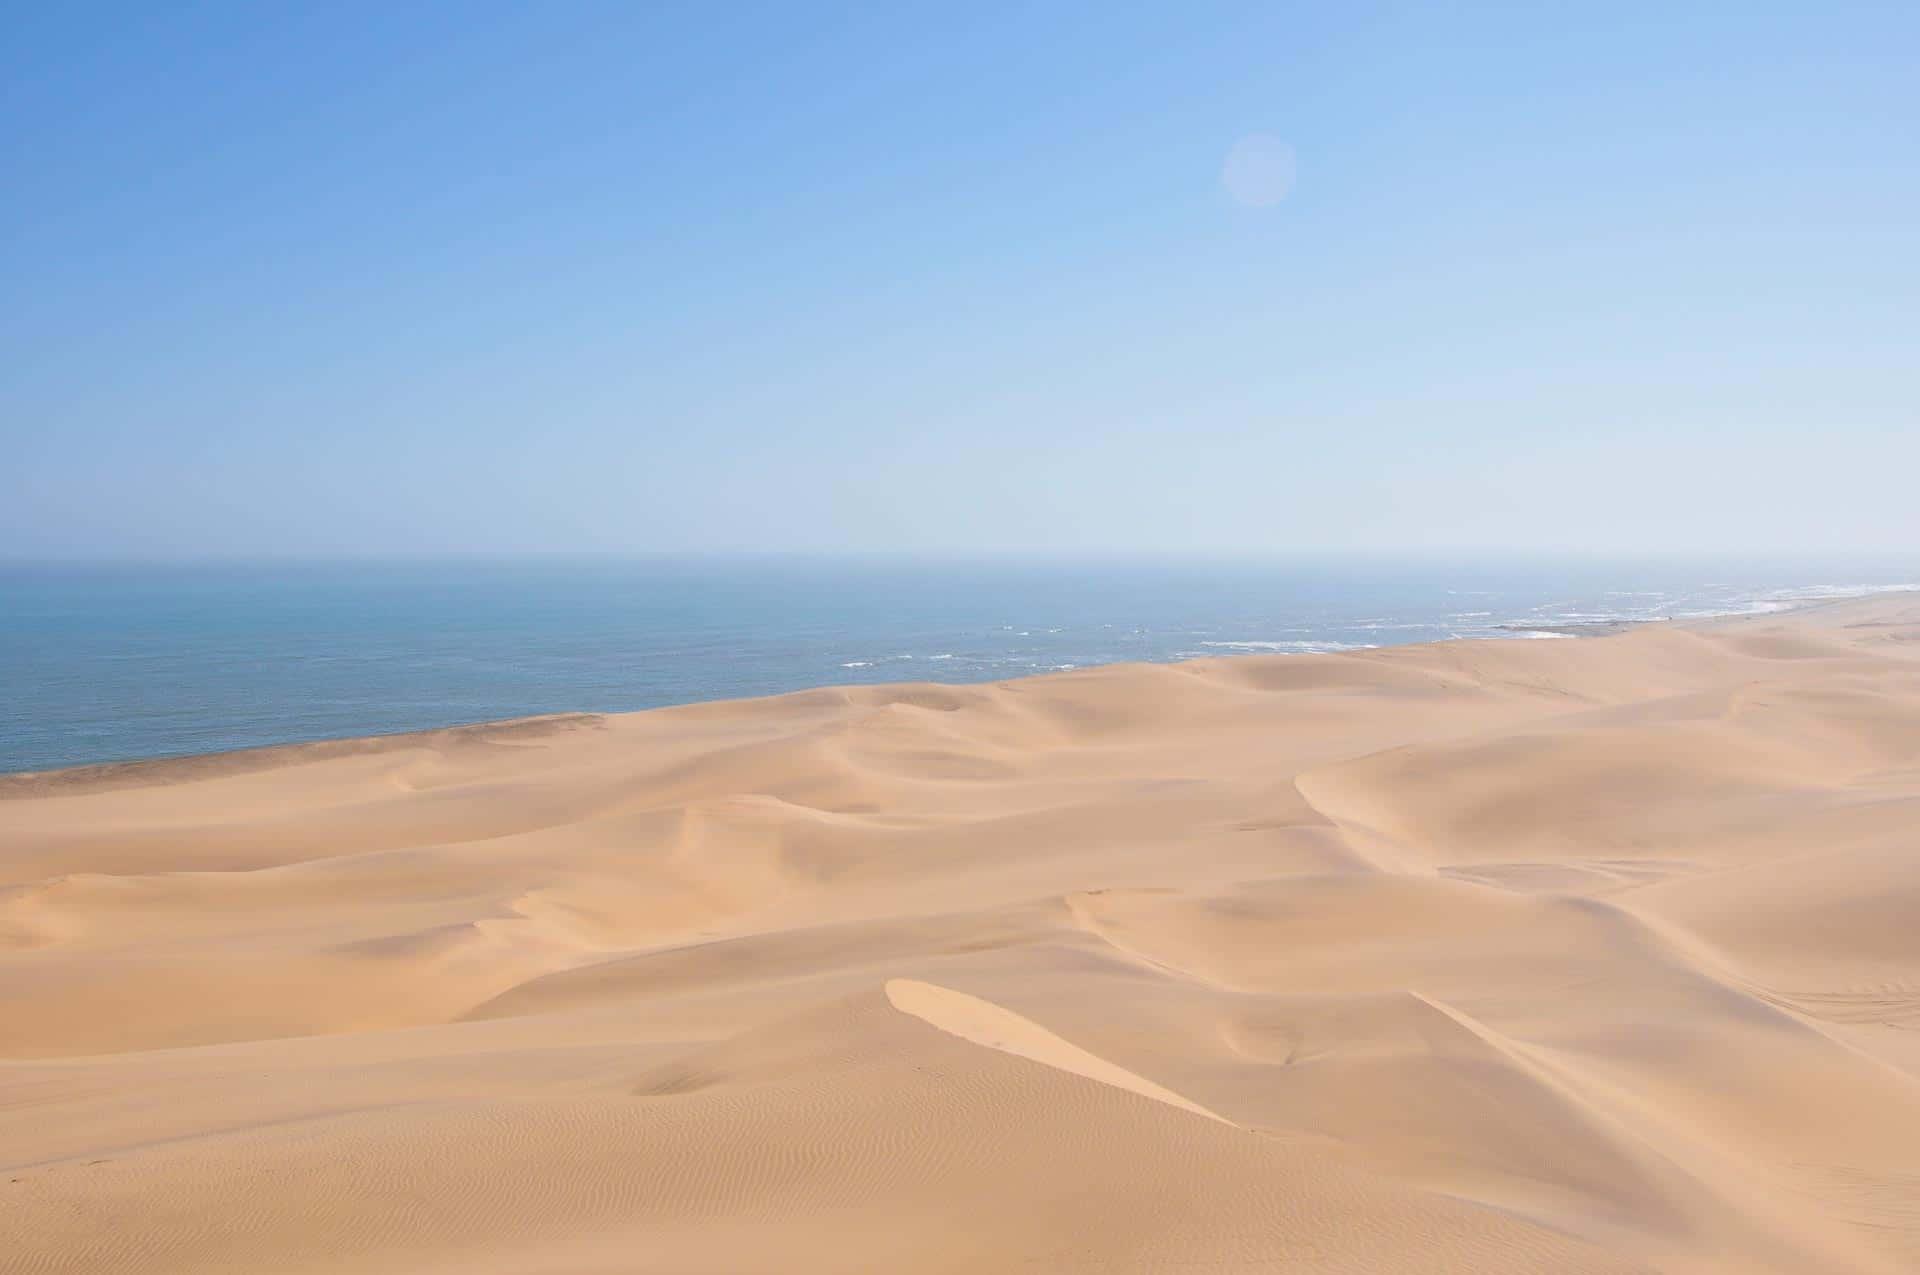 Living-Desert-Tour-Swakopmund-Namibia-Globetrotter-Select-27